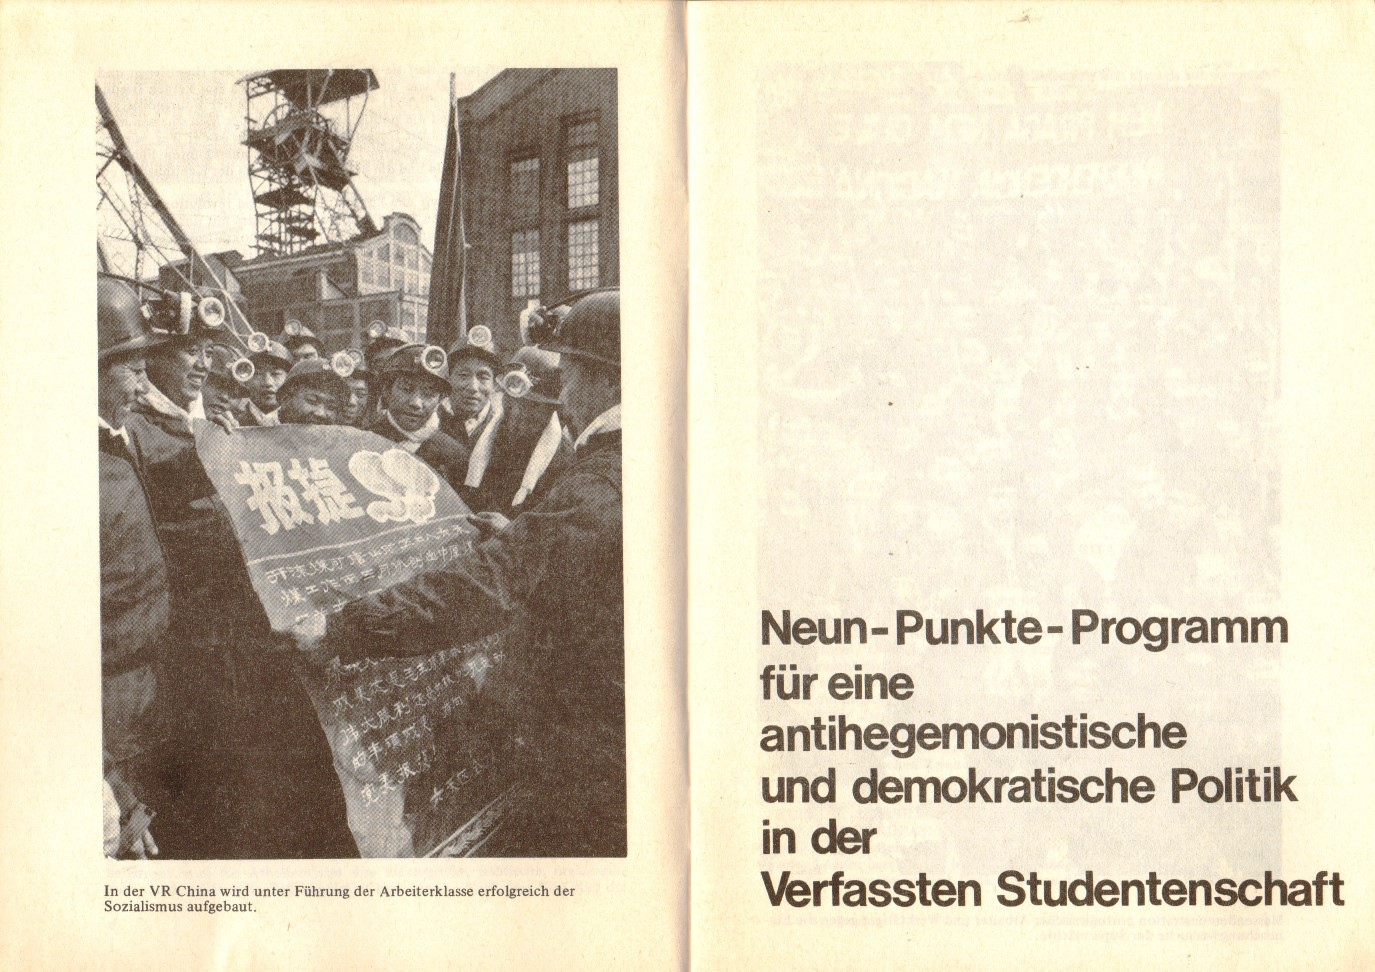 KSV_1976_Verfasste_Studentenschaft_06